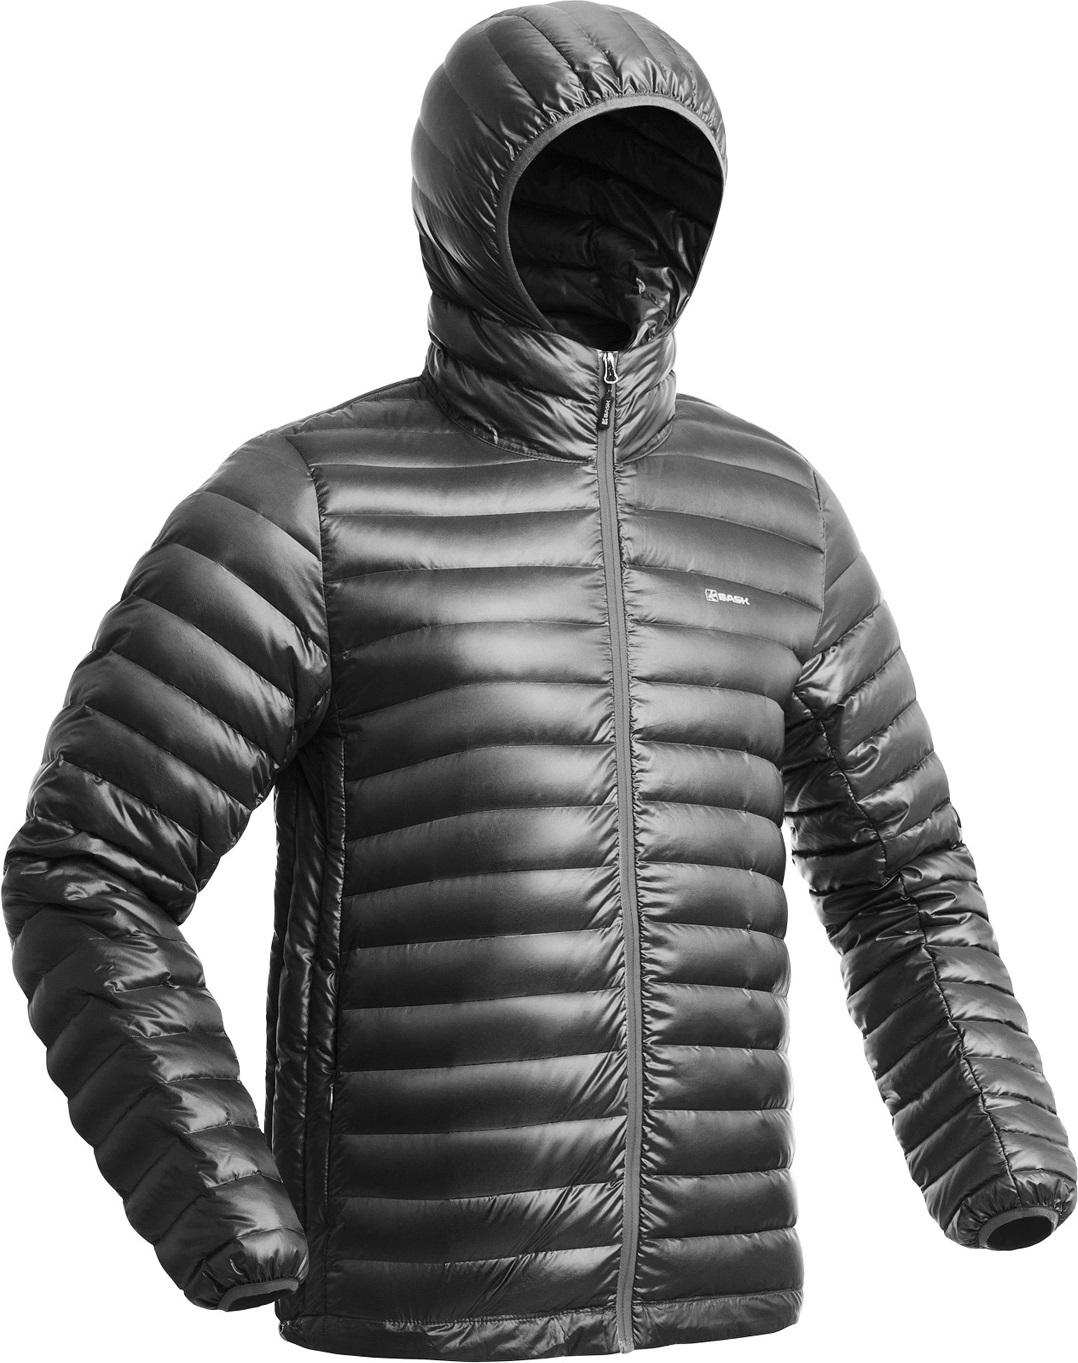 Куртка пуховая BASK CHAMONIX LIGHT MJ серая, Куртки - арт. 1149360156